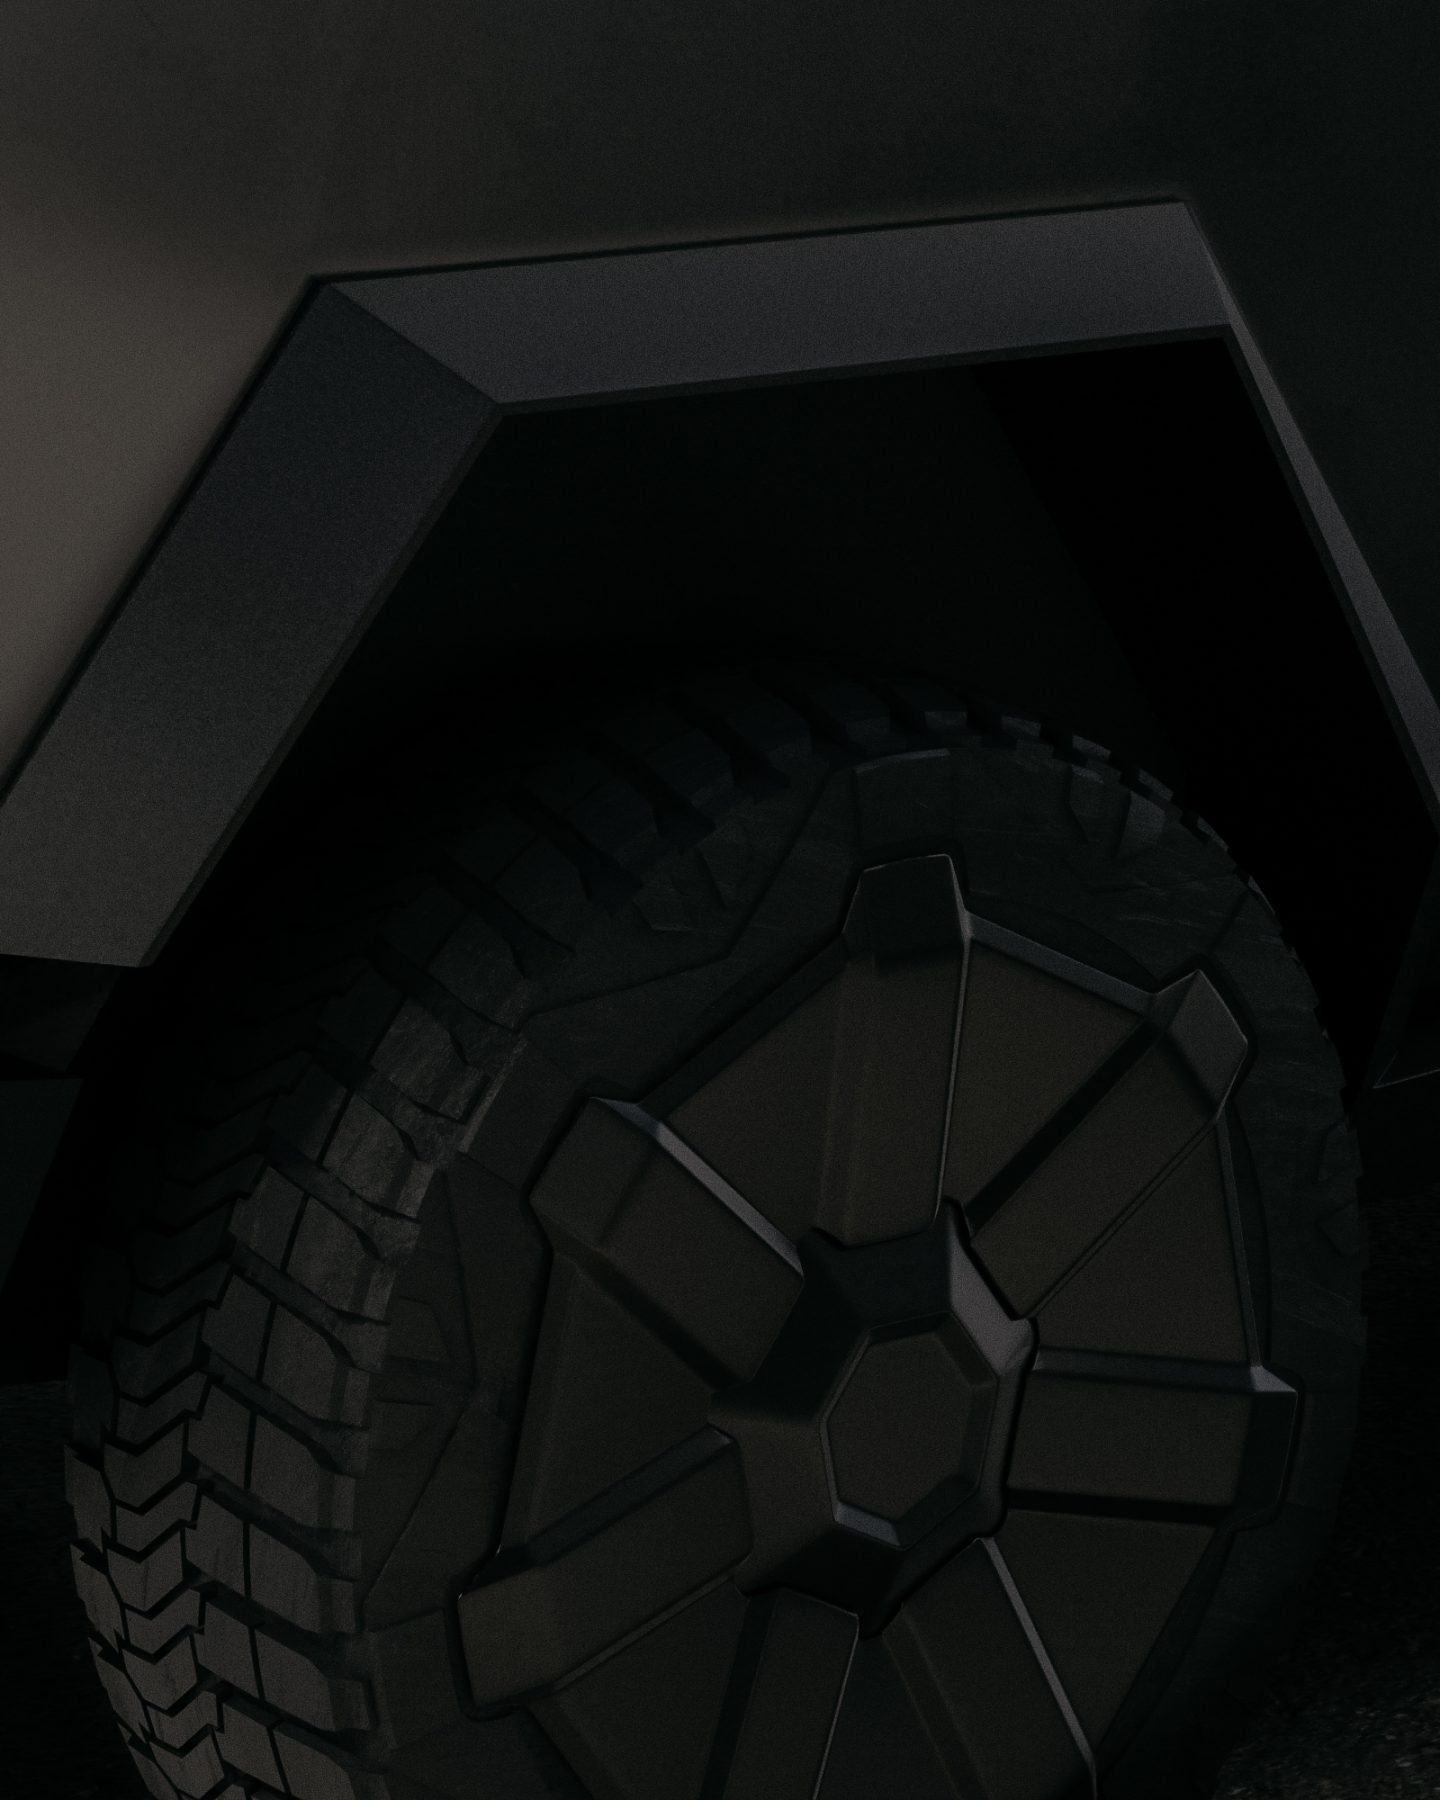 IGNANT-Tesla-cybertruck-cgi-brutalism-cgi-editorial-9